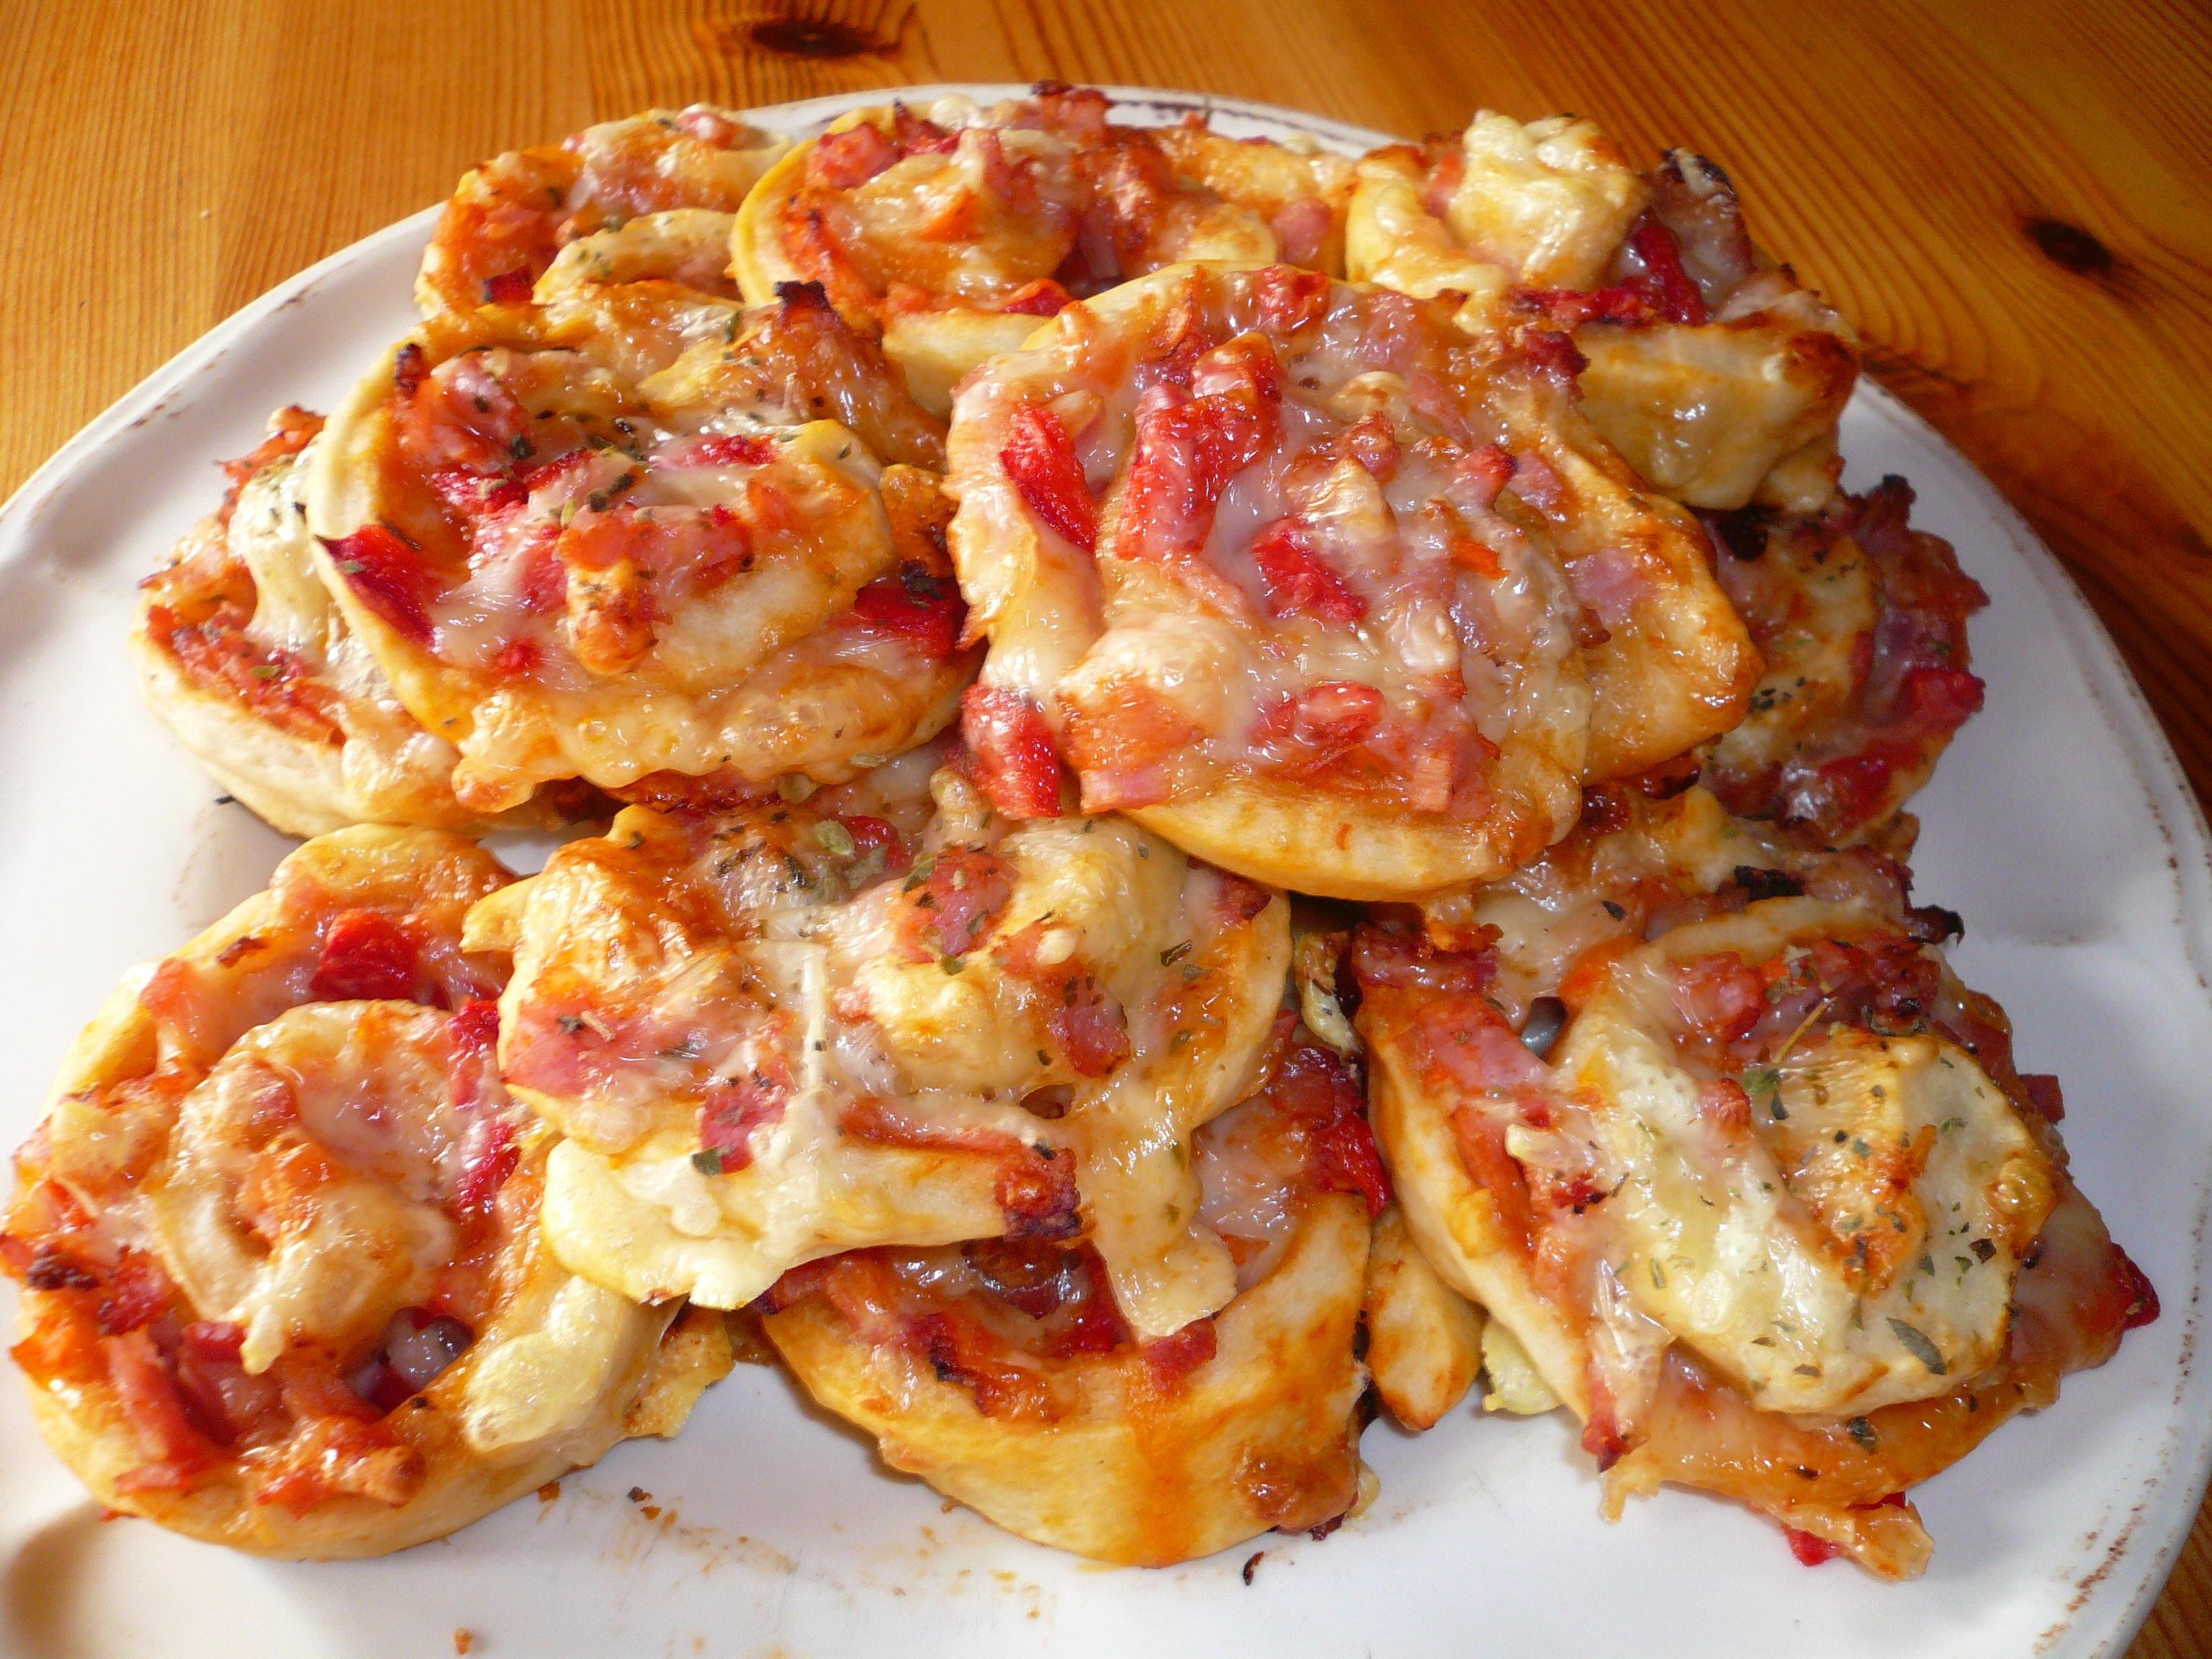 pizza deg utan vetemjöl